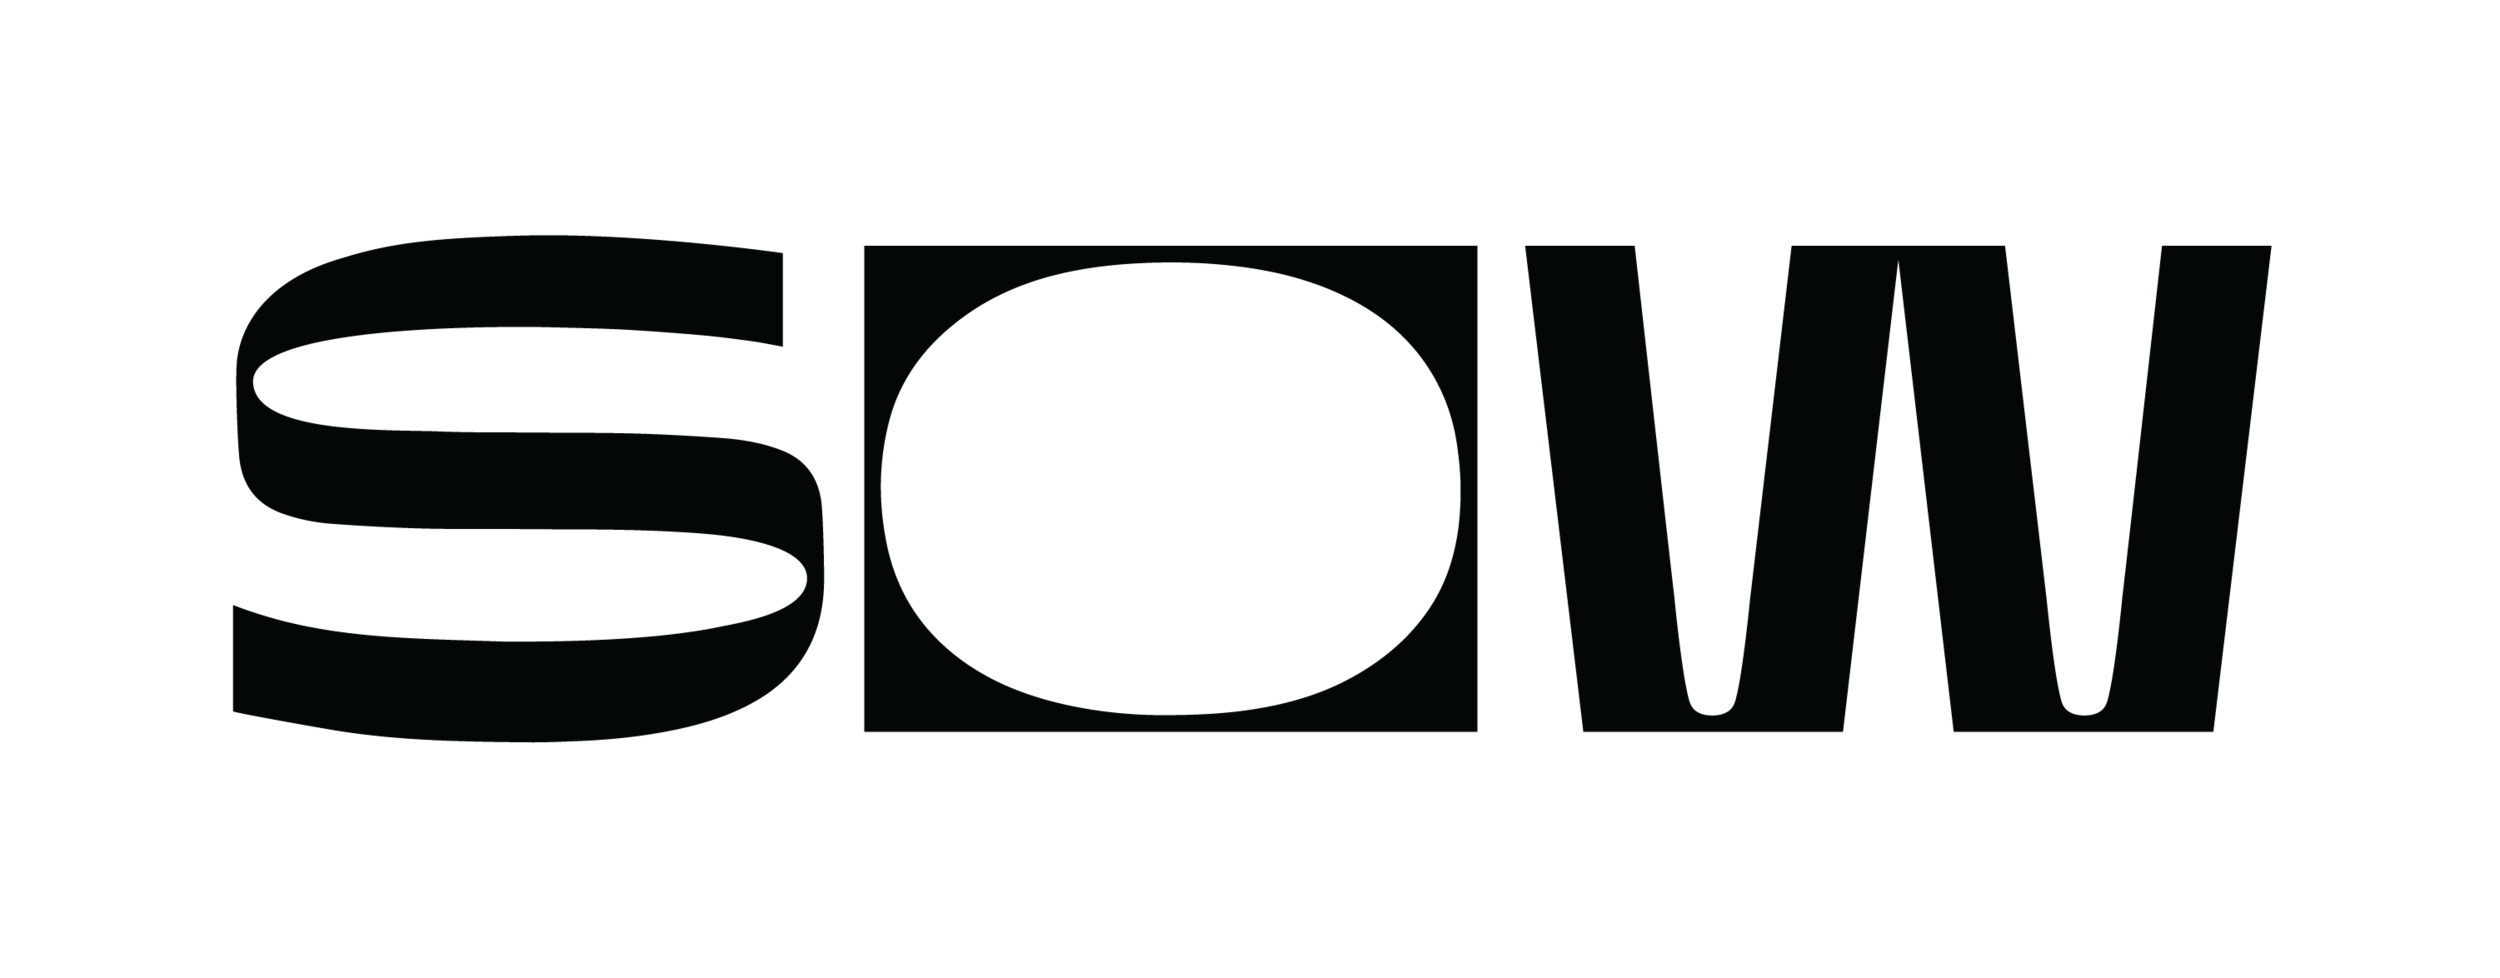 SOW_LogoBlack_Artboard 1.png